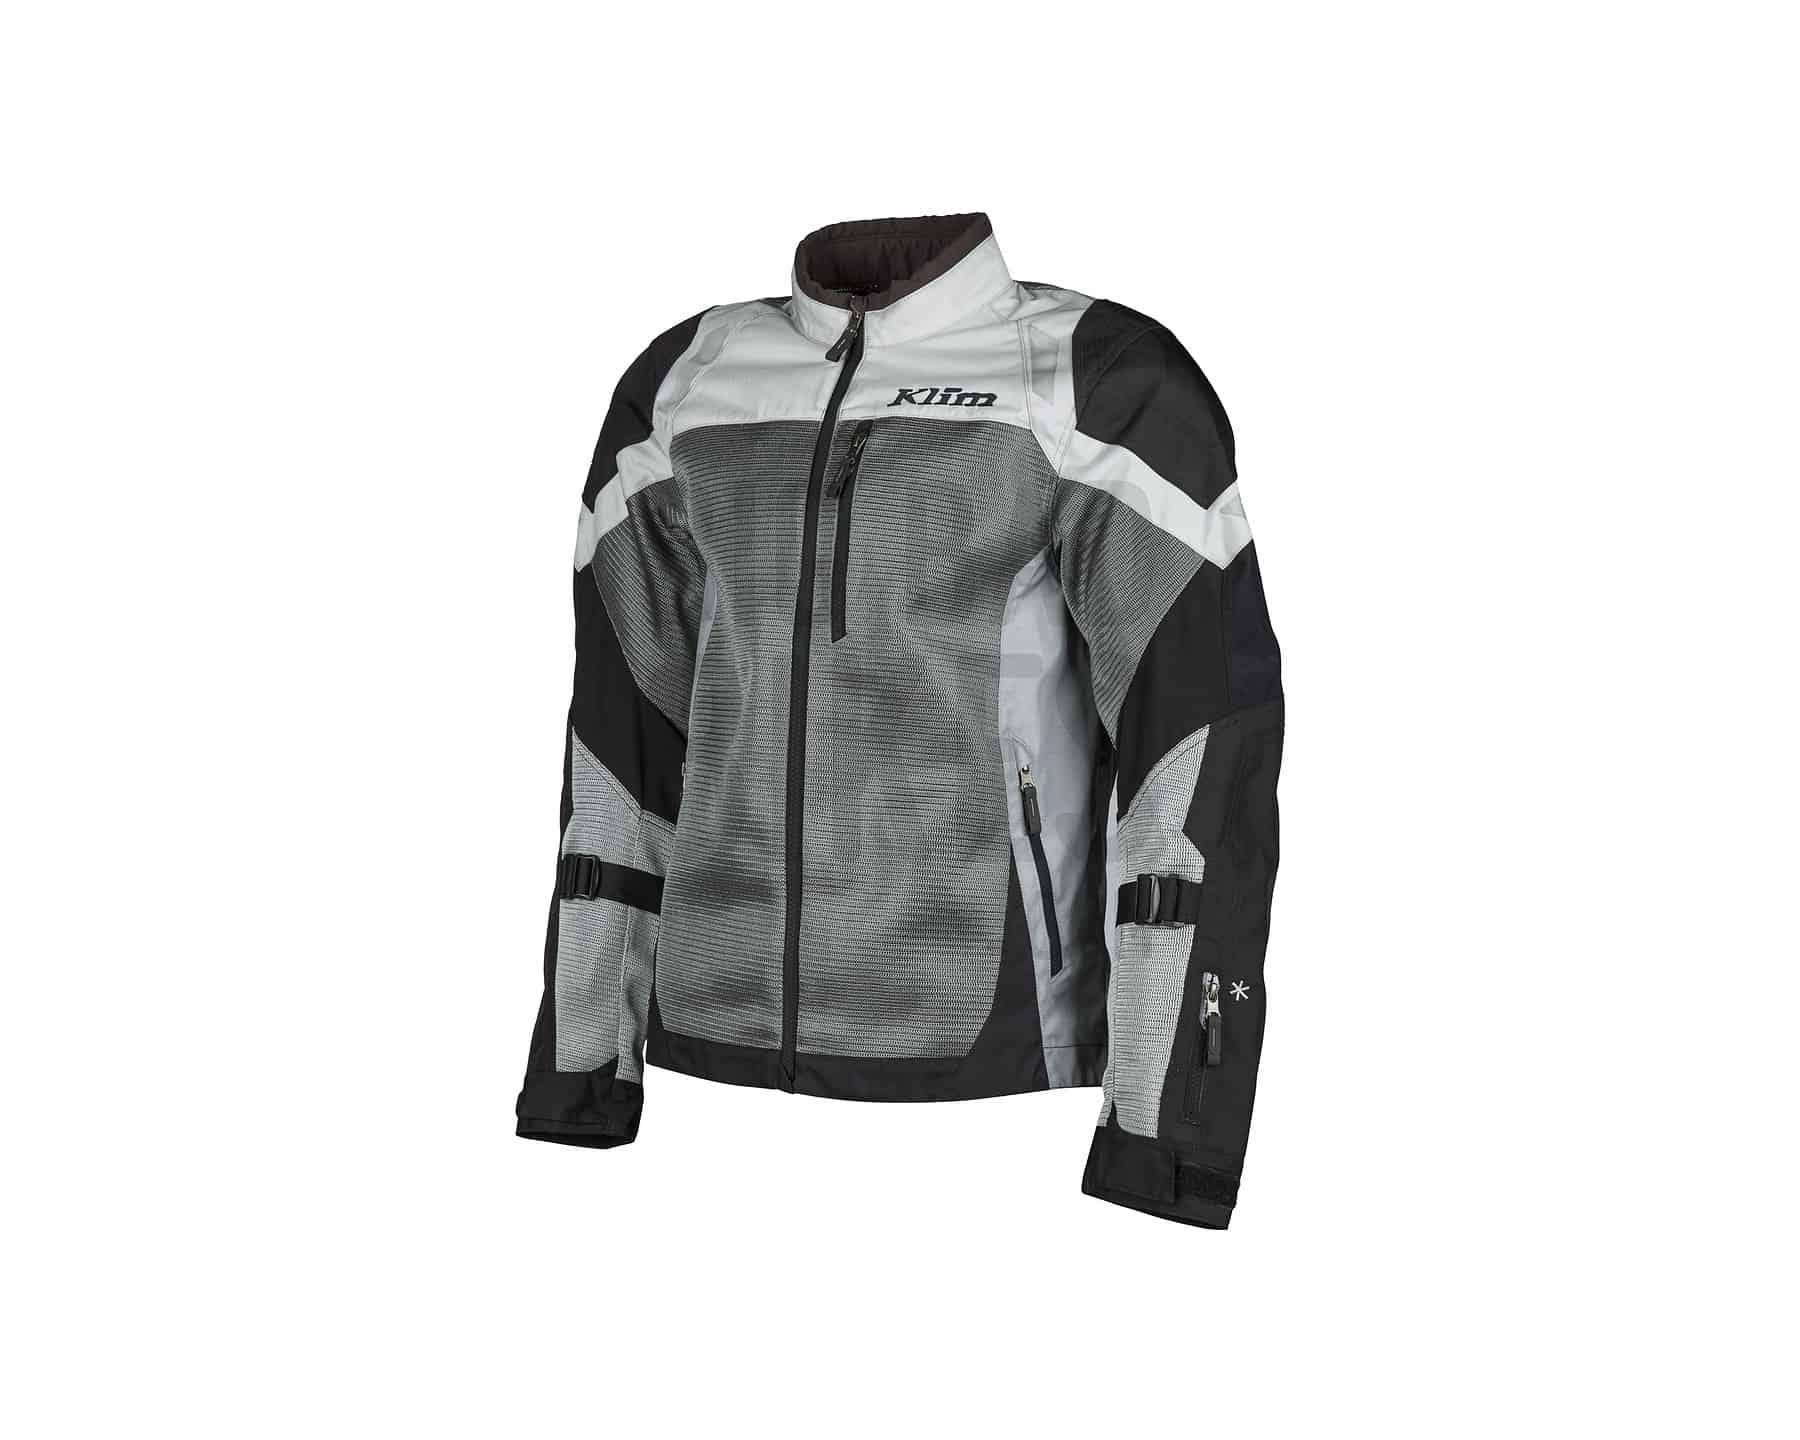 Induction Jacket_5060-002_Light Gray_02